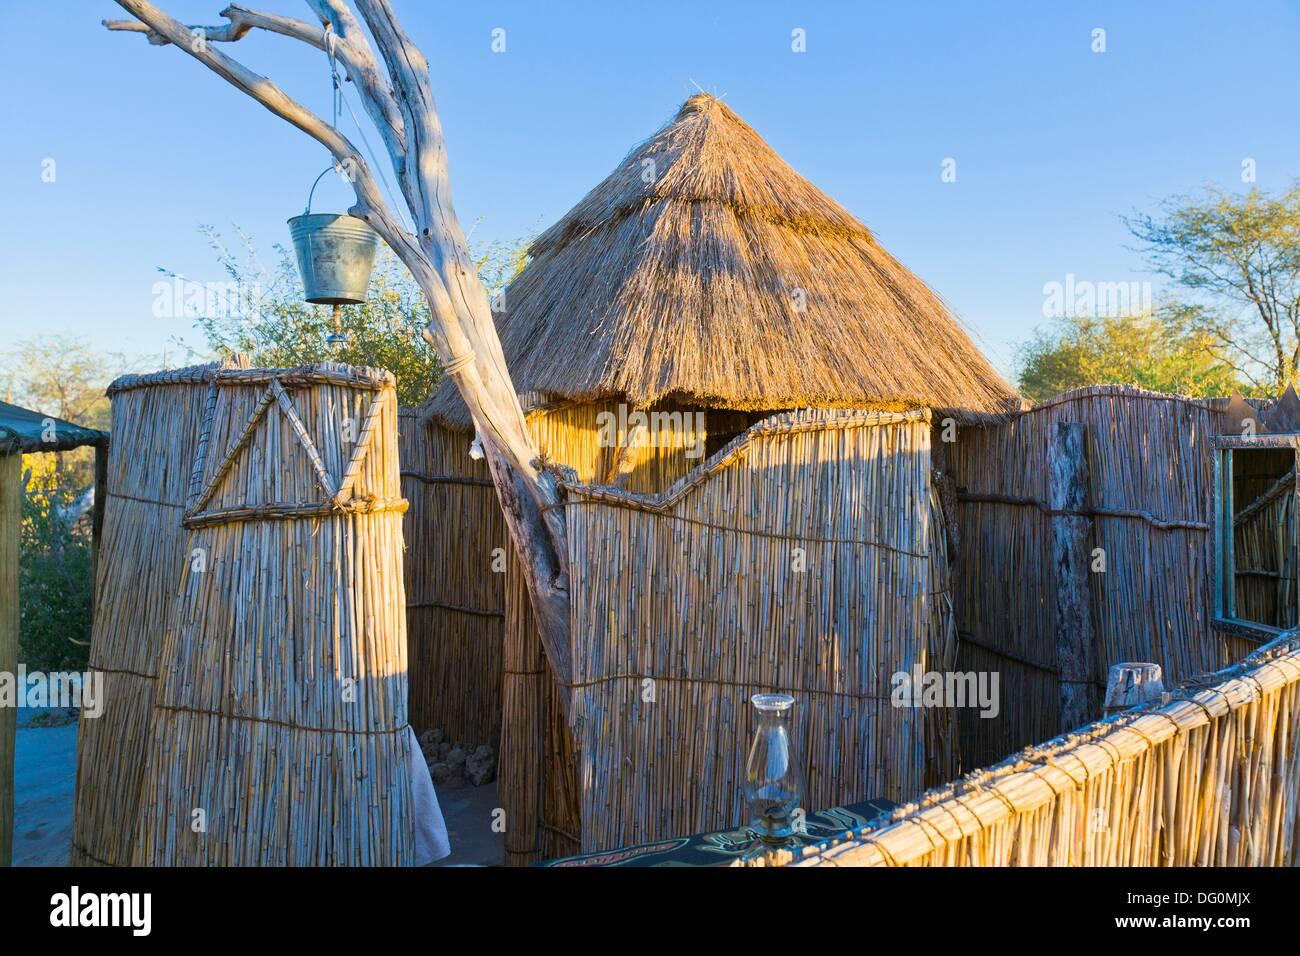 Plante Salle De Bain Lumineuse ~ Salle De Bains Dans Un Camp Safari Africain Traditionnel Botswana